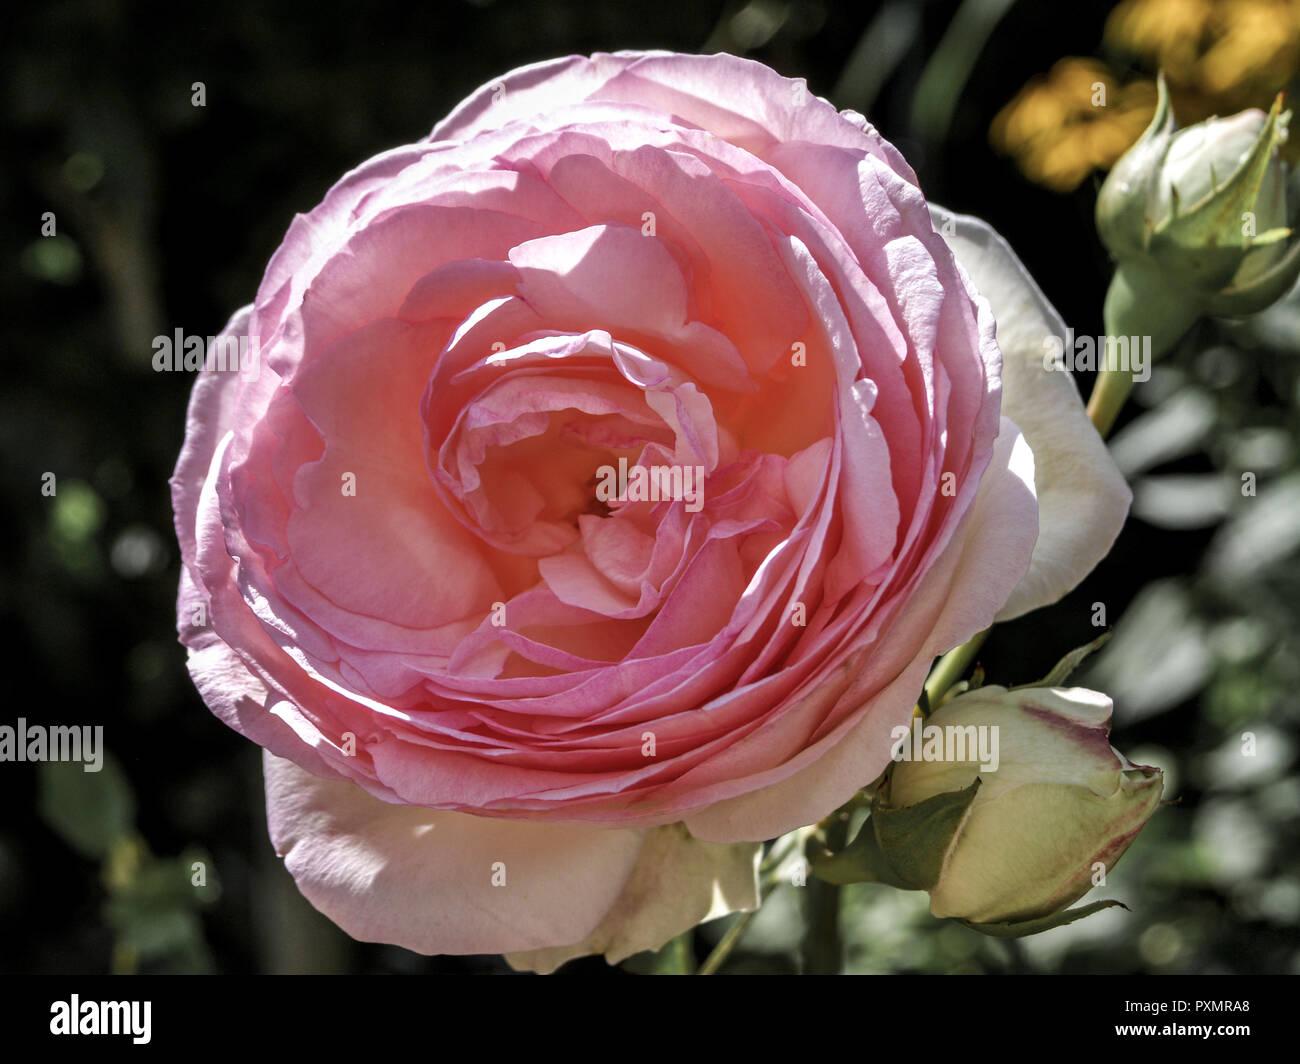 Rose, Weiss, Rosa, Blume, Bluete, Rosen, Rosenbluete, Natur, Pflanze, Reinheit, Schönheit, Romantik, Duft, Pflanzen, Blumen, Sommerblumen Stockbild